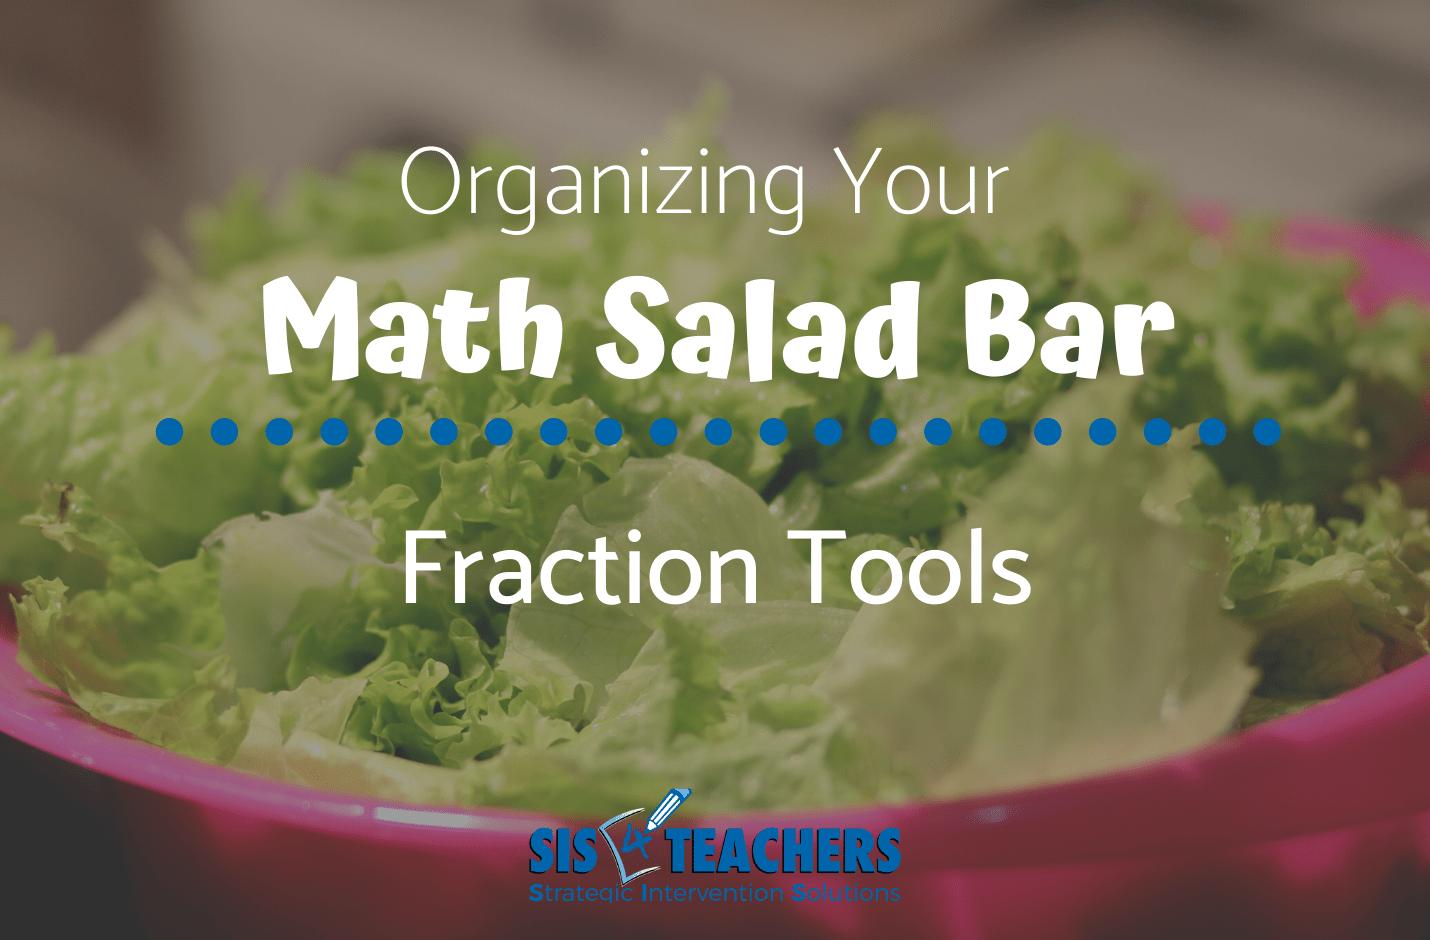 Organizing Your Math Salad Bar: Fraction Tools